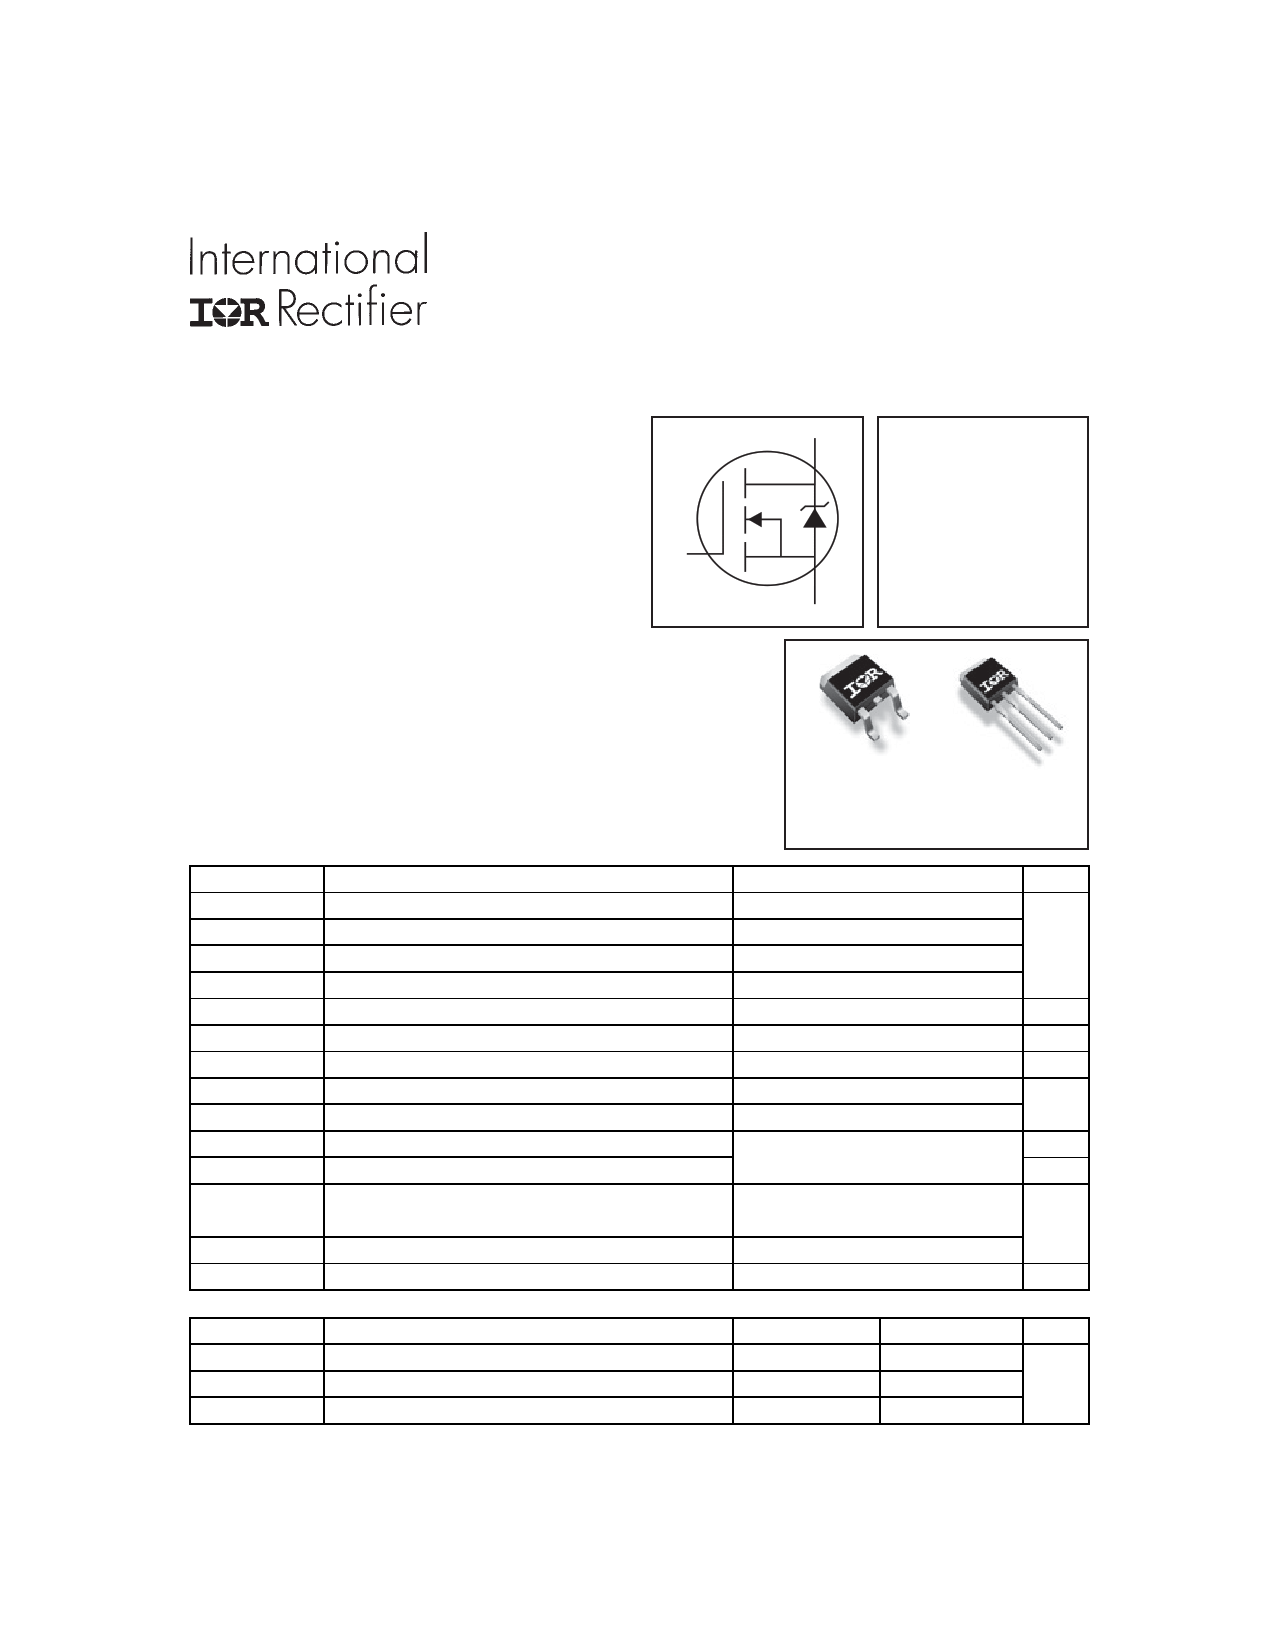 IRFR2607Z Datasheet, IRFR2607Z PDF,ピン配置, 機能